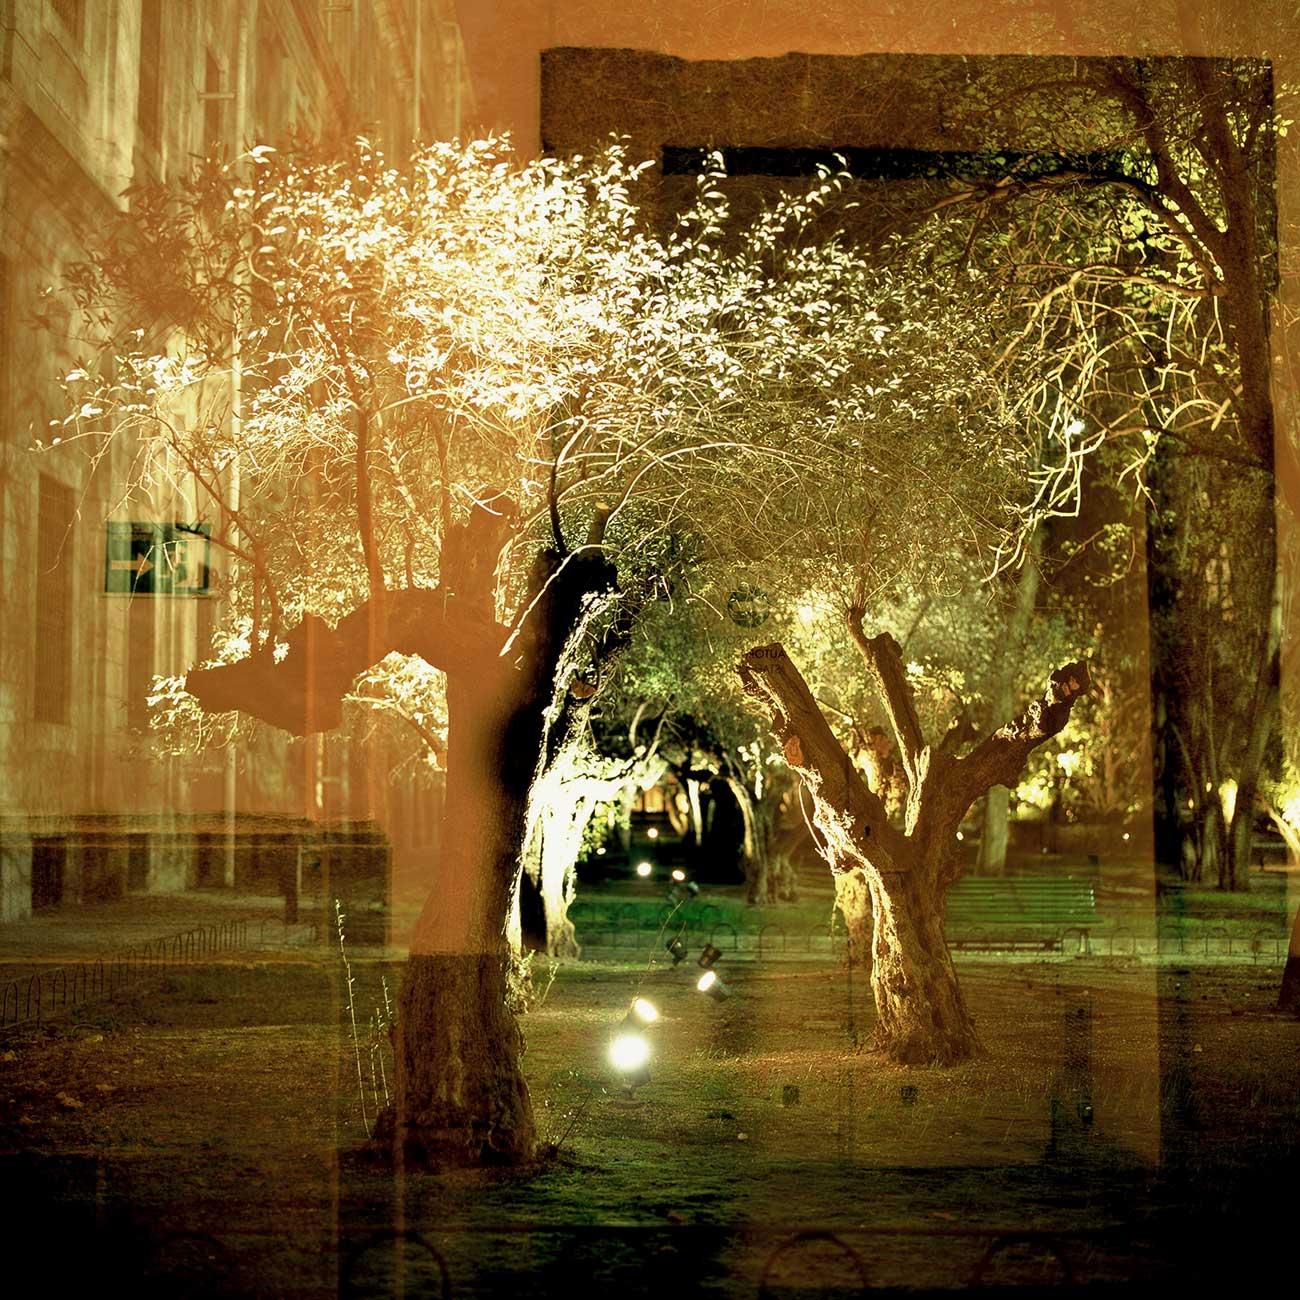 Mini-3-Passage-interdimensionnel Sebastien Fantini photographie d'art contemporaine